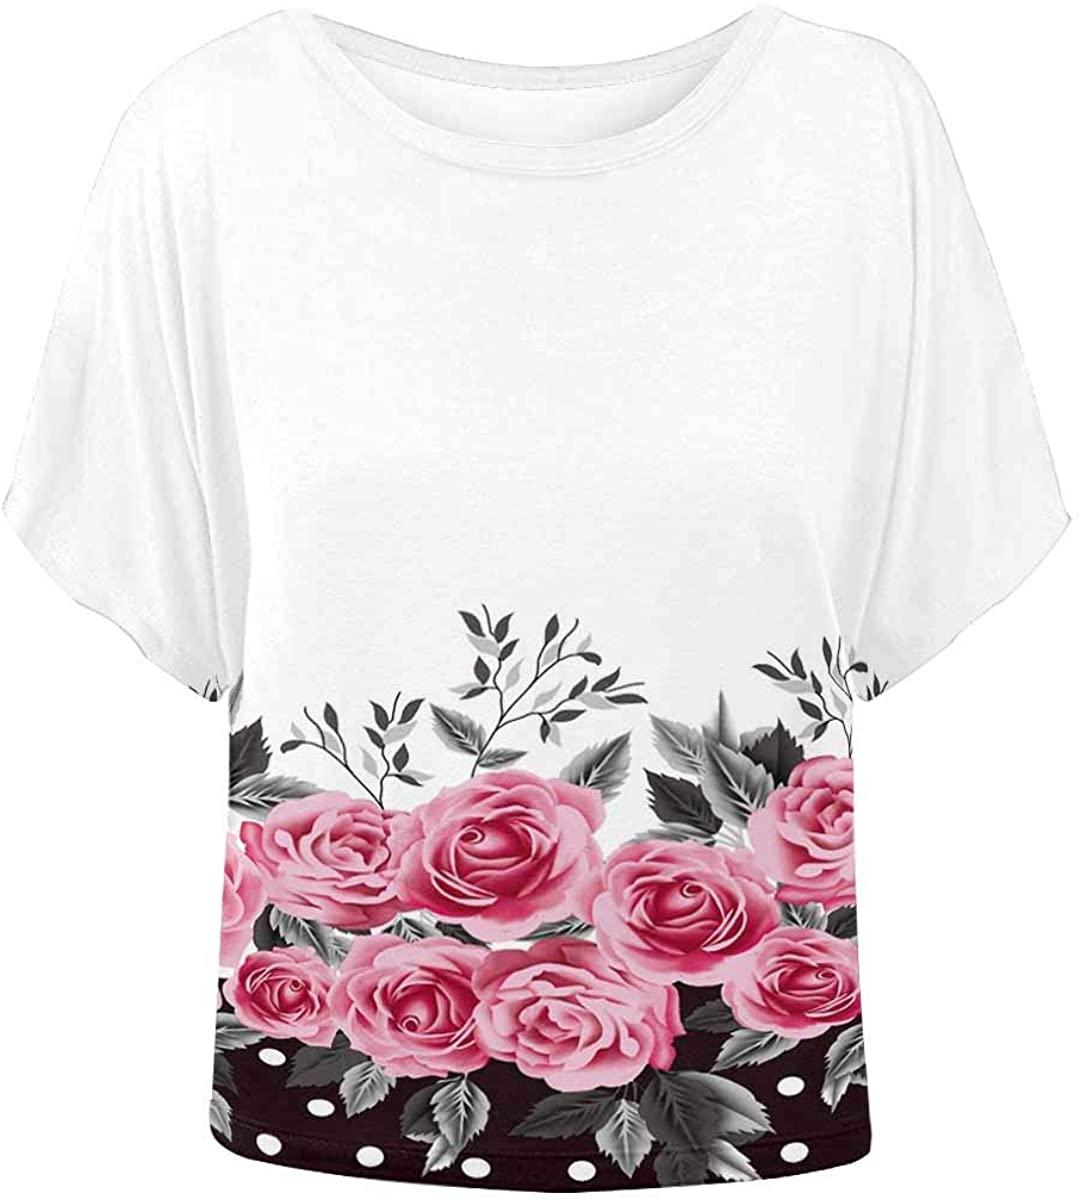 INTERESTPRINT Women Short Sleeve Tops Vintage Roses Flowers Elegant Blouse